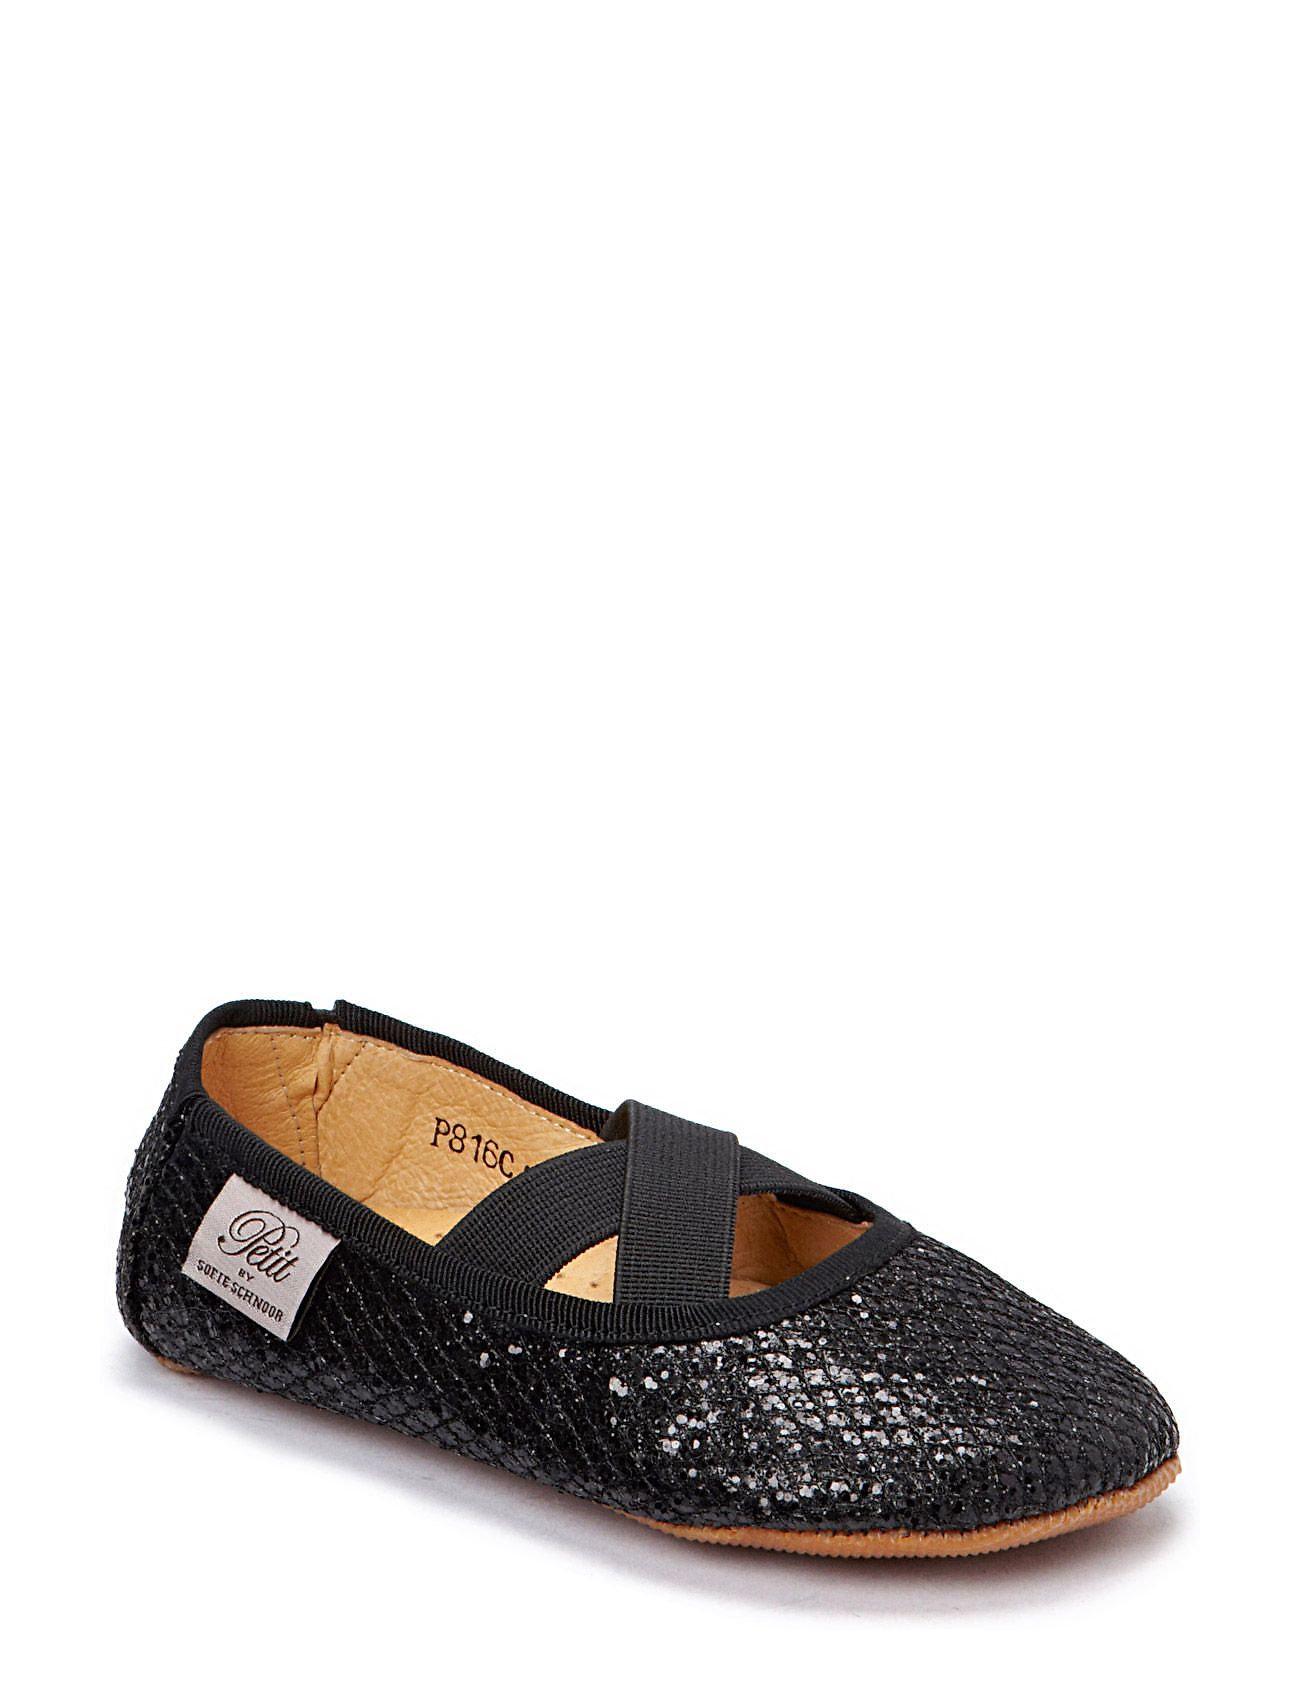 Petit by Sofie Schnoor Indoors shoe - glitter - BLACK